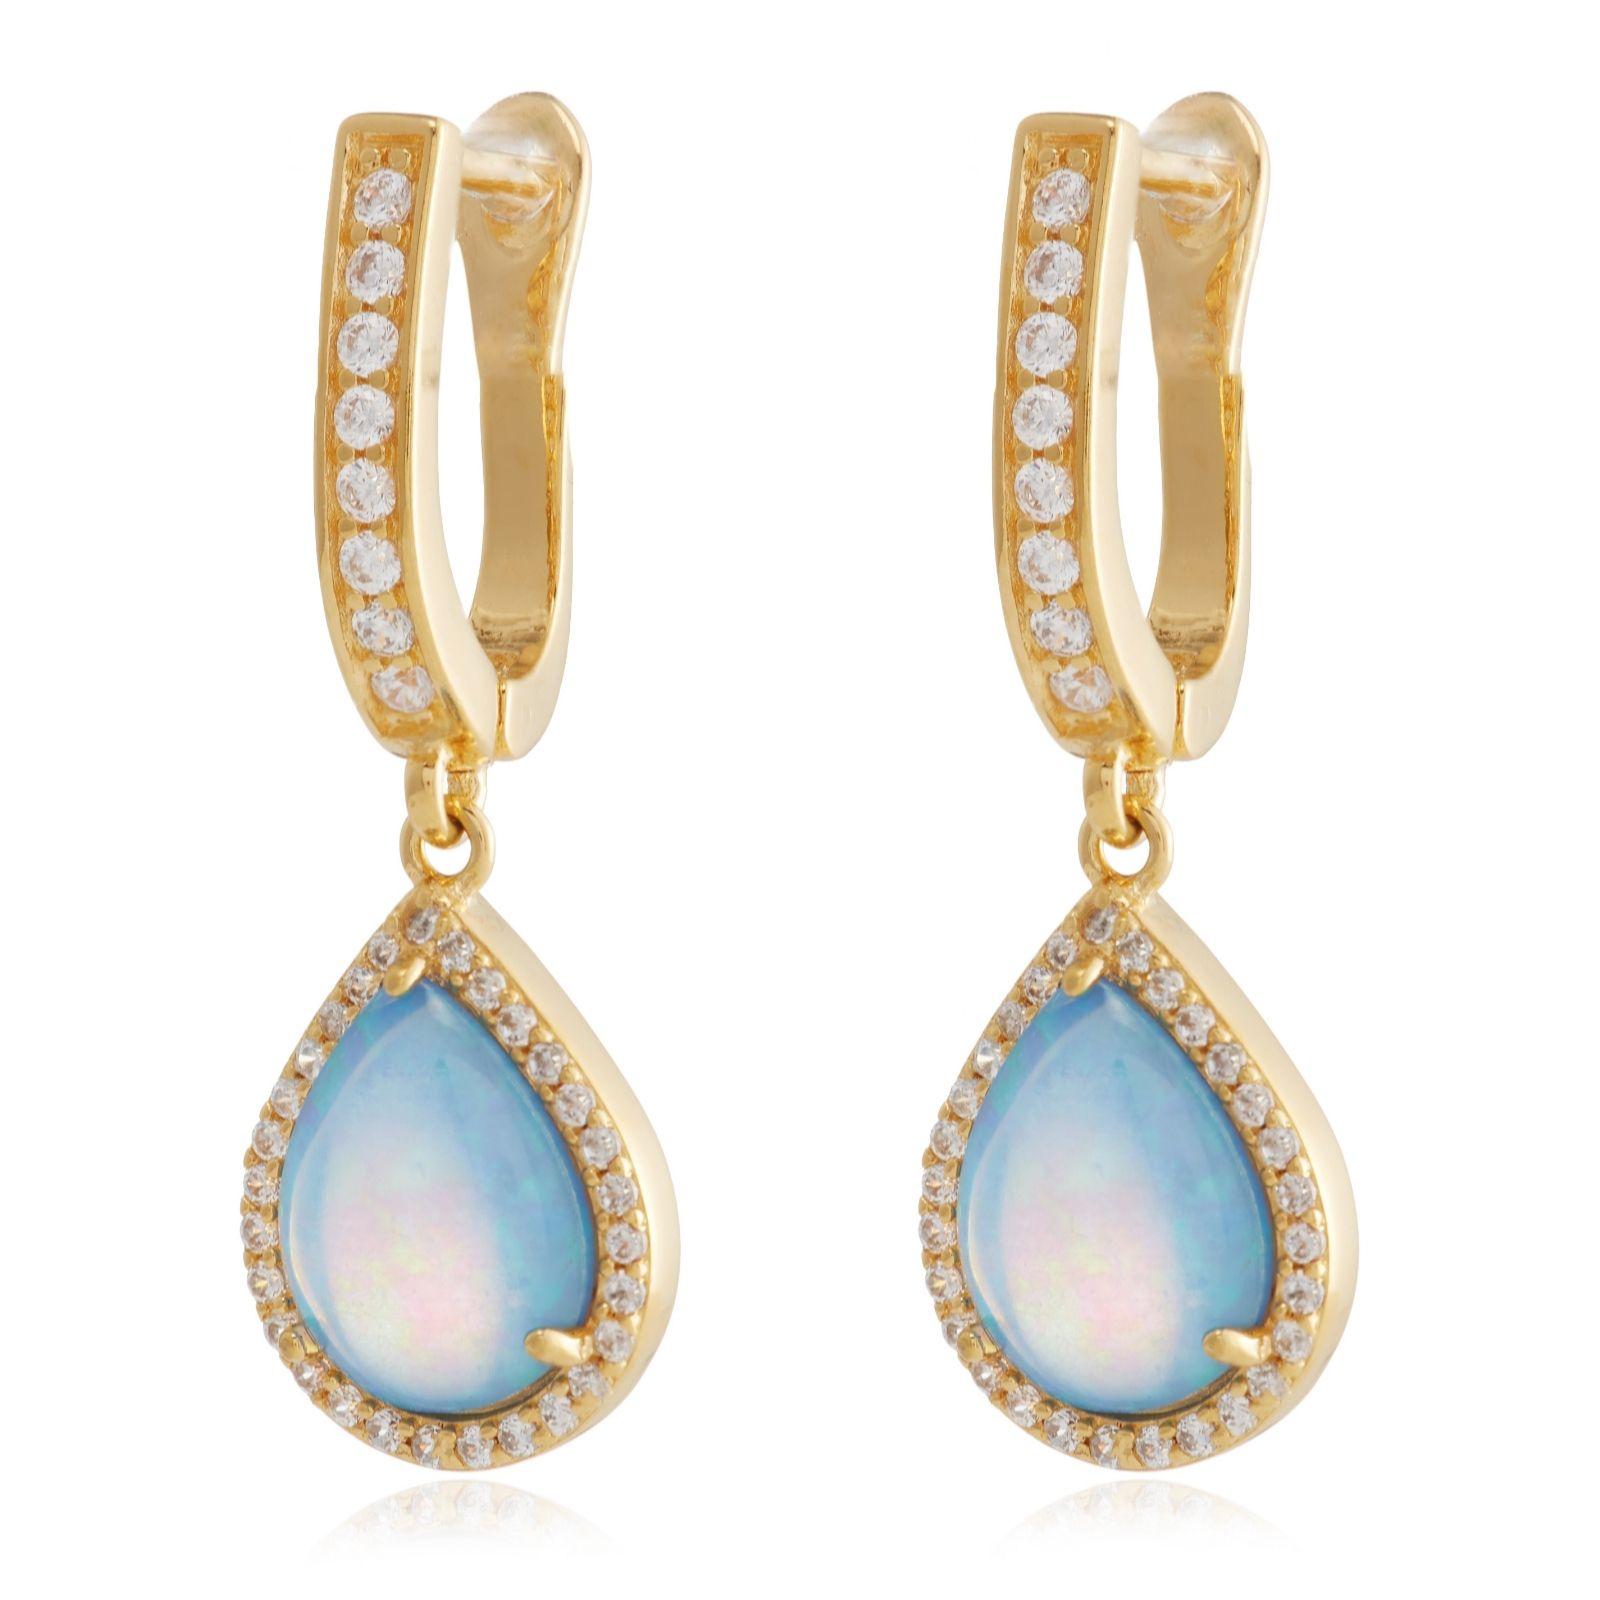 14272f17e Diamonique 1ct tw Opal Halo Leverback Earrings Sterling Silver ...